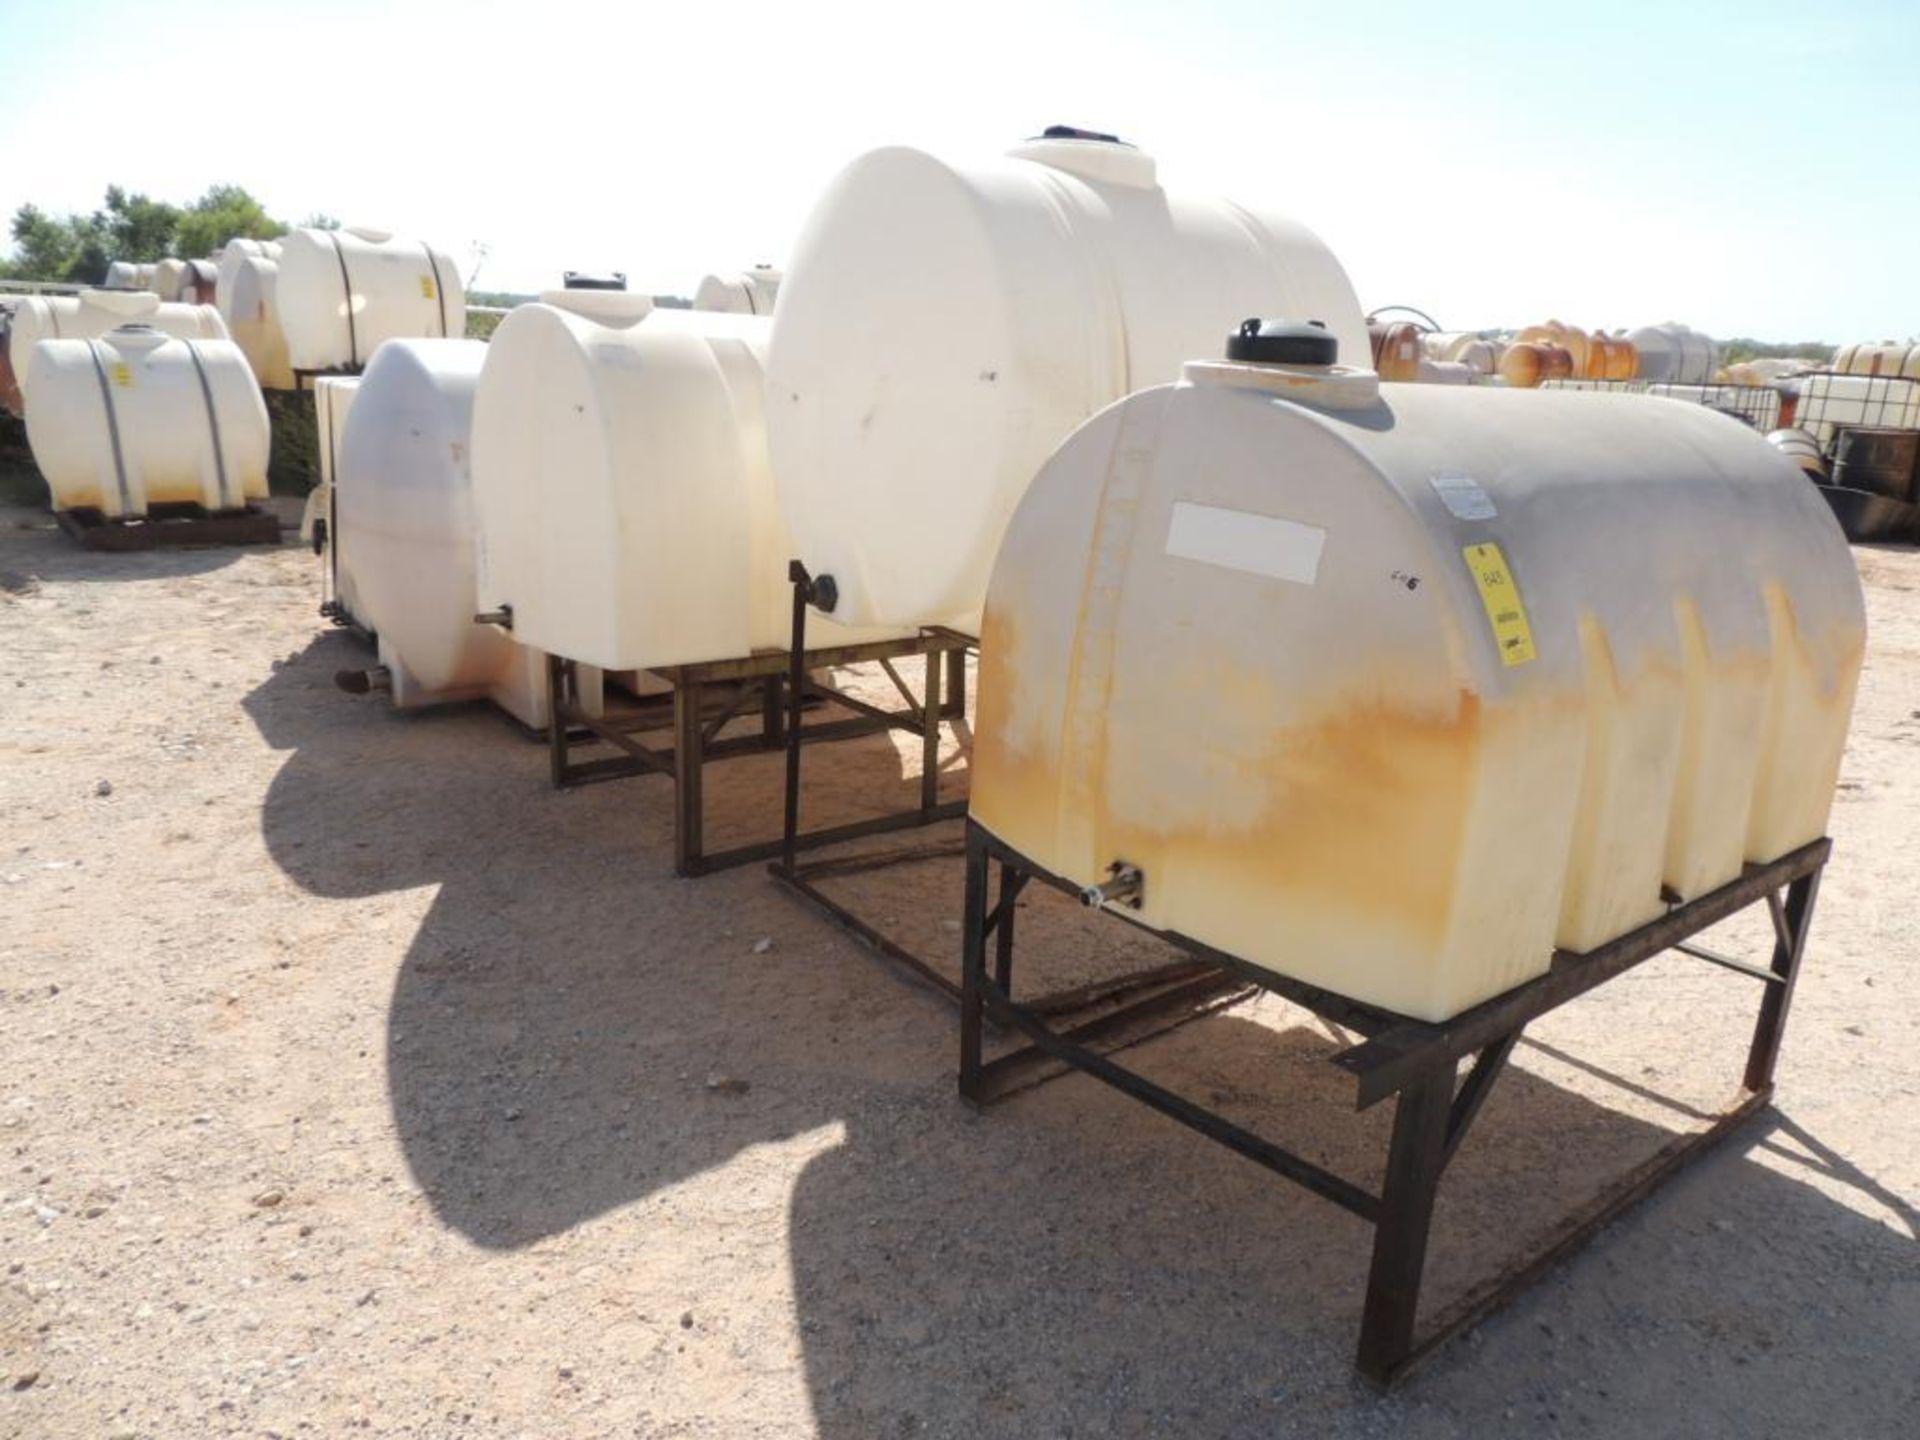 LOT: (7) Poly Tanks - (1) 535 Gallon, (3) 330 Gallon, (3) 80 Gallon (LOCATED IN HENNESSEY, OK. -